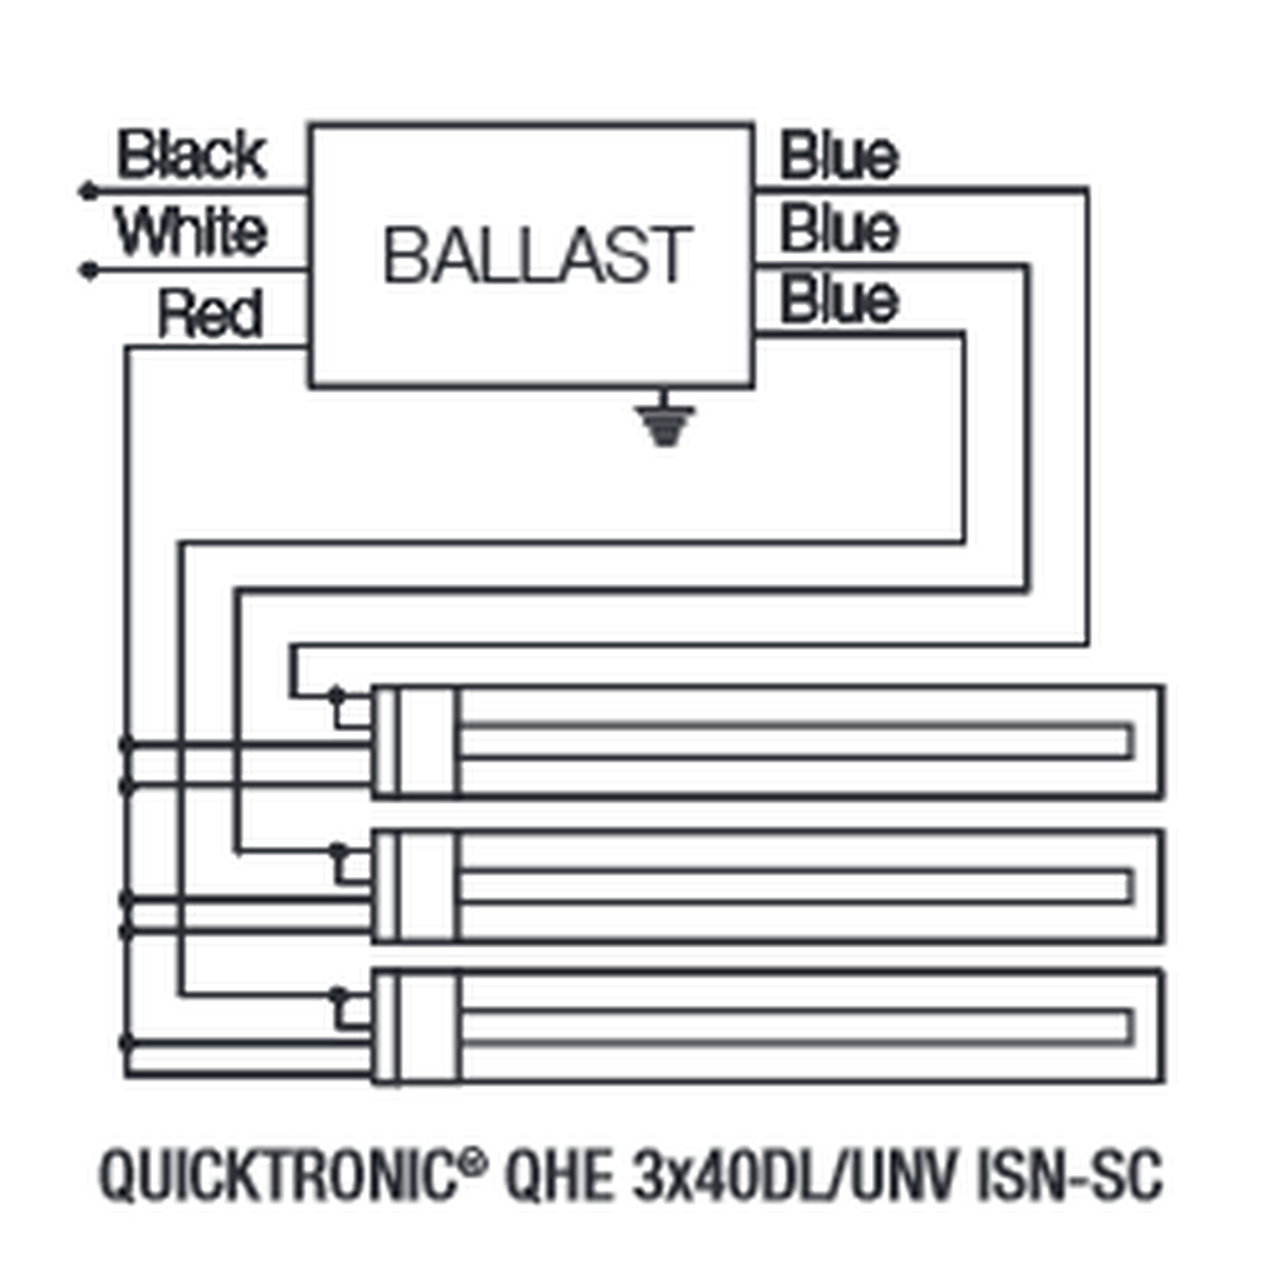 Qhe3x40dl Unv Isn Sc Sylvania 49430 Quicktronic Electronic Ballast